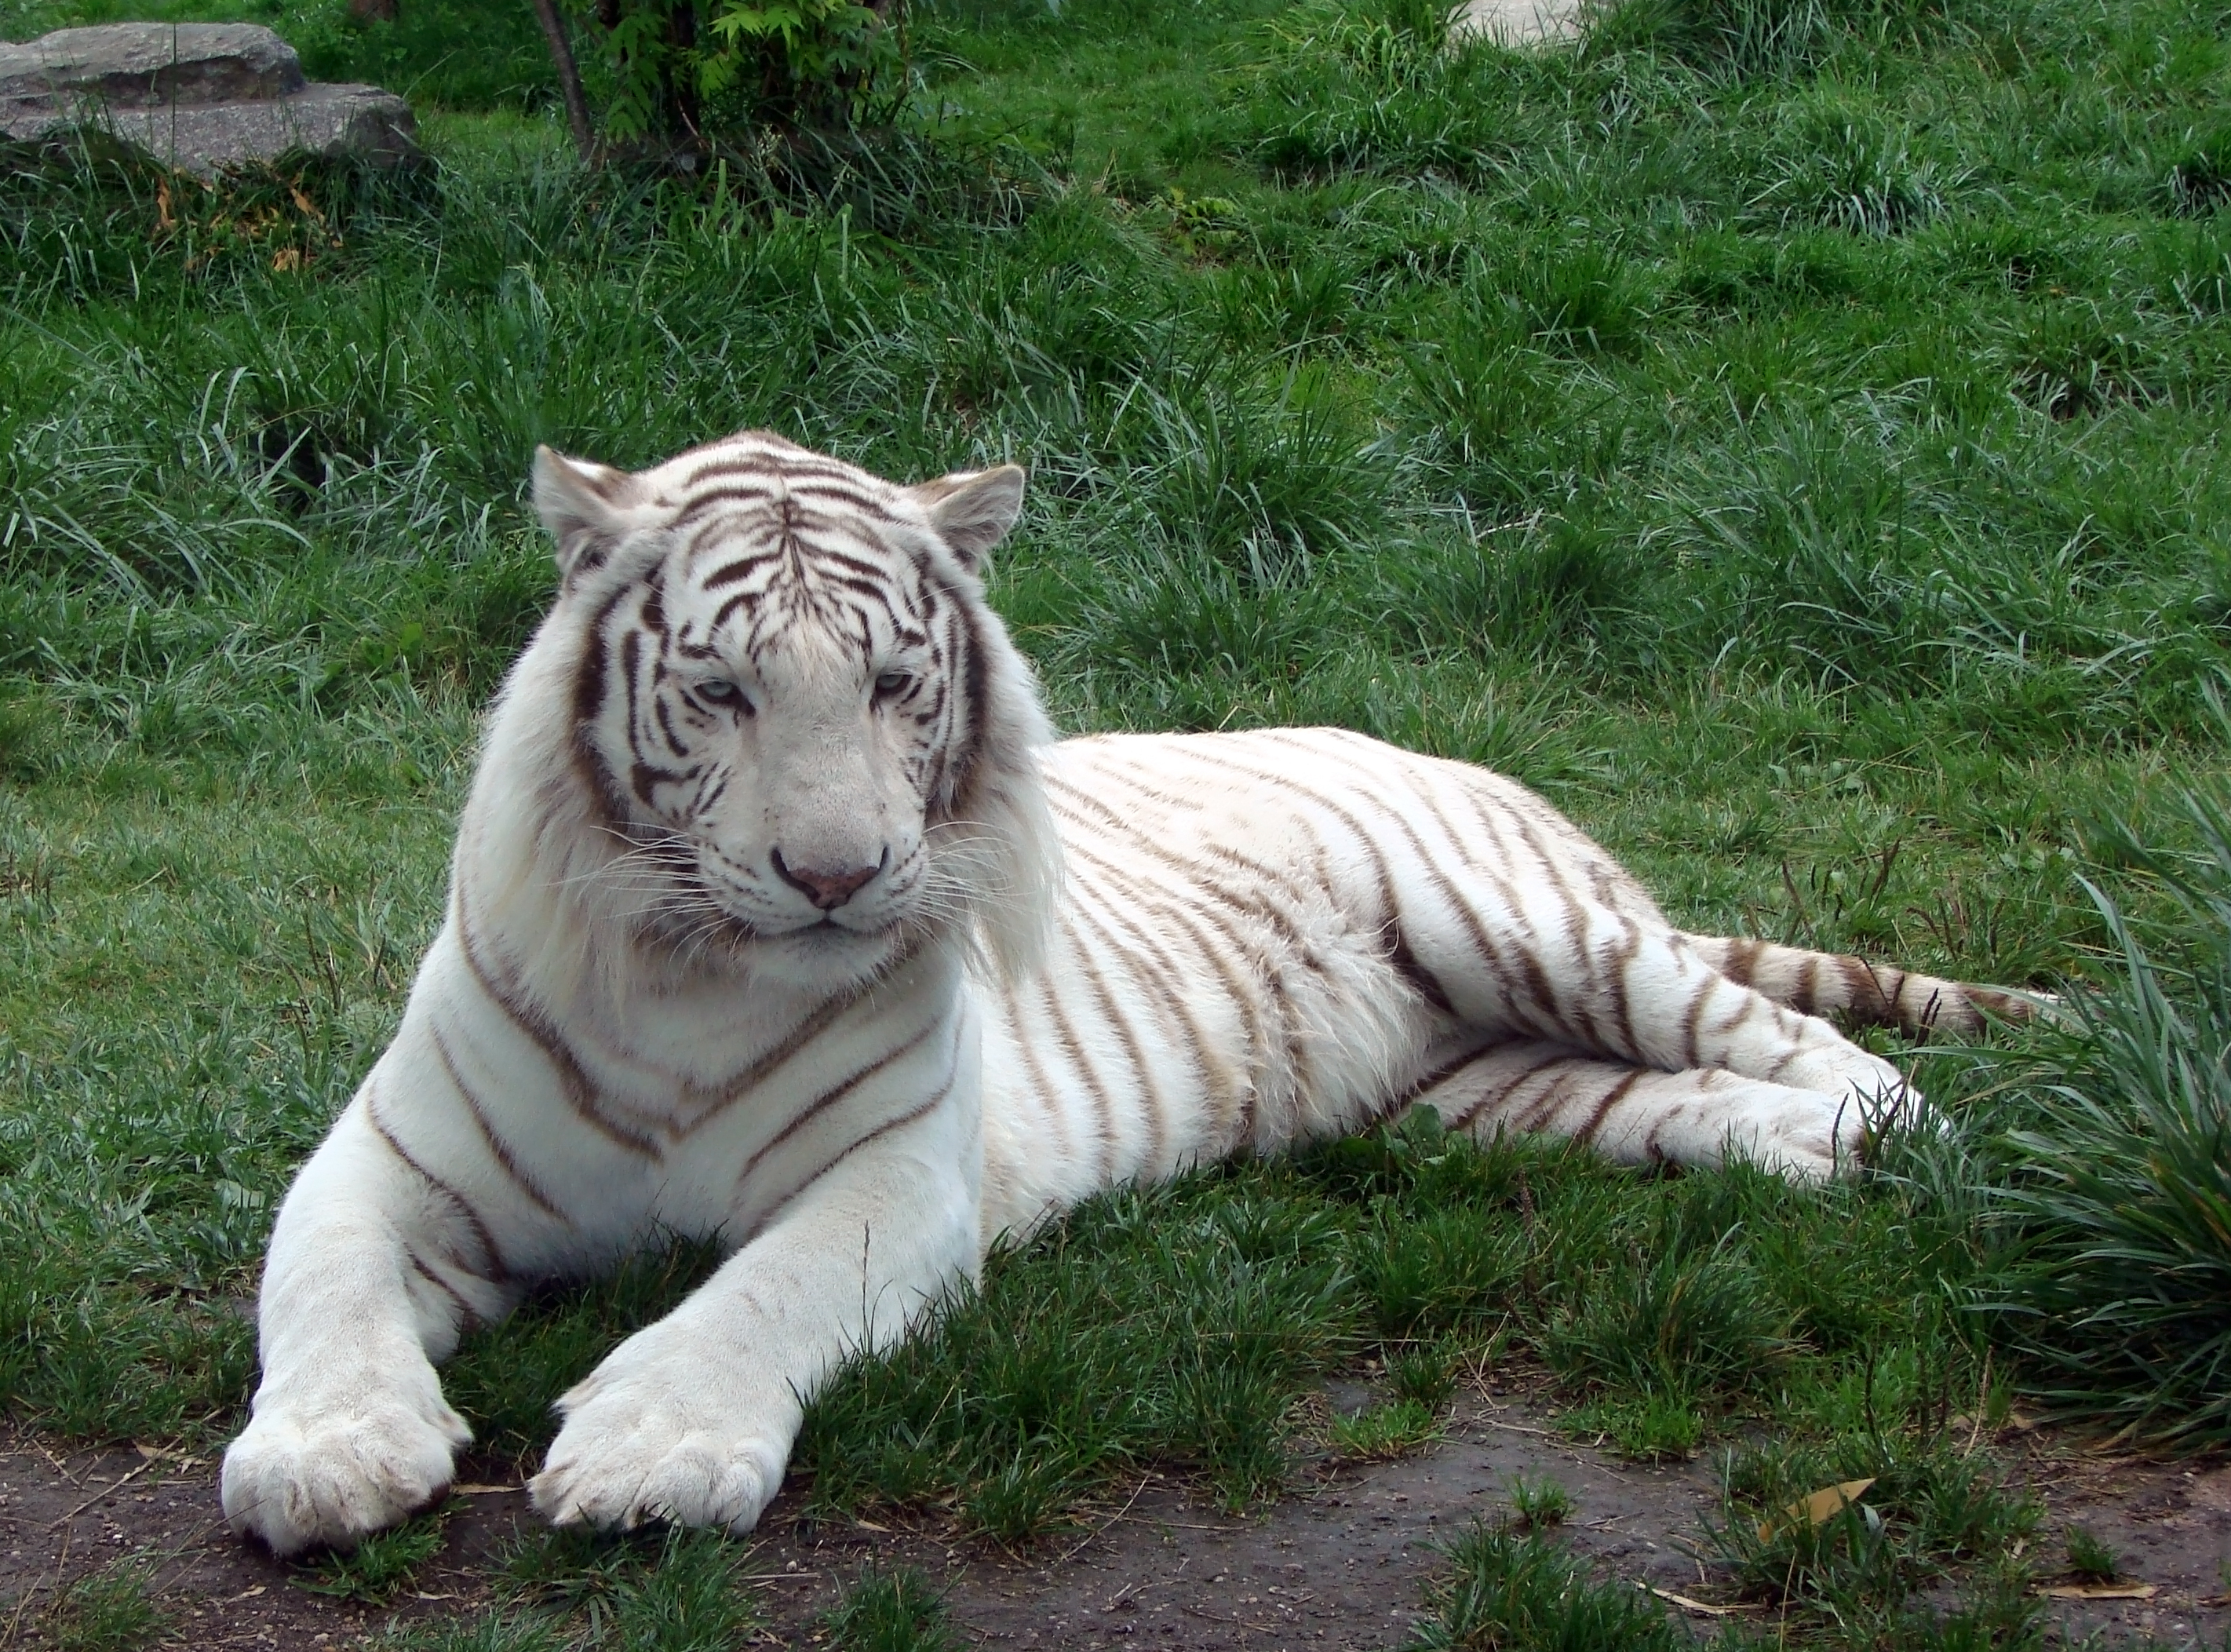 Une Heure Pour Soi Fameck Tarifs file:tigre blanc zoo d'amnéville 27082010 4 - wikimedia